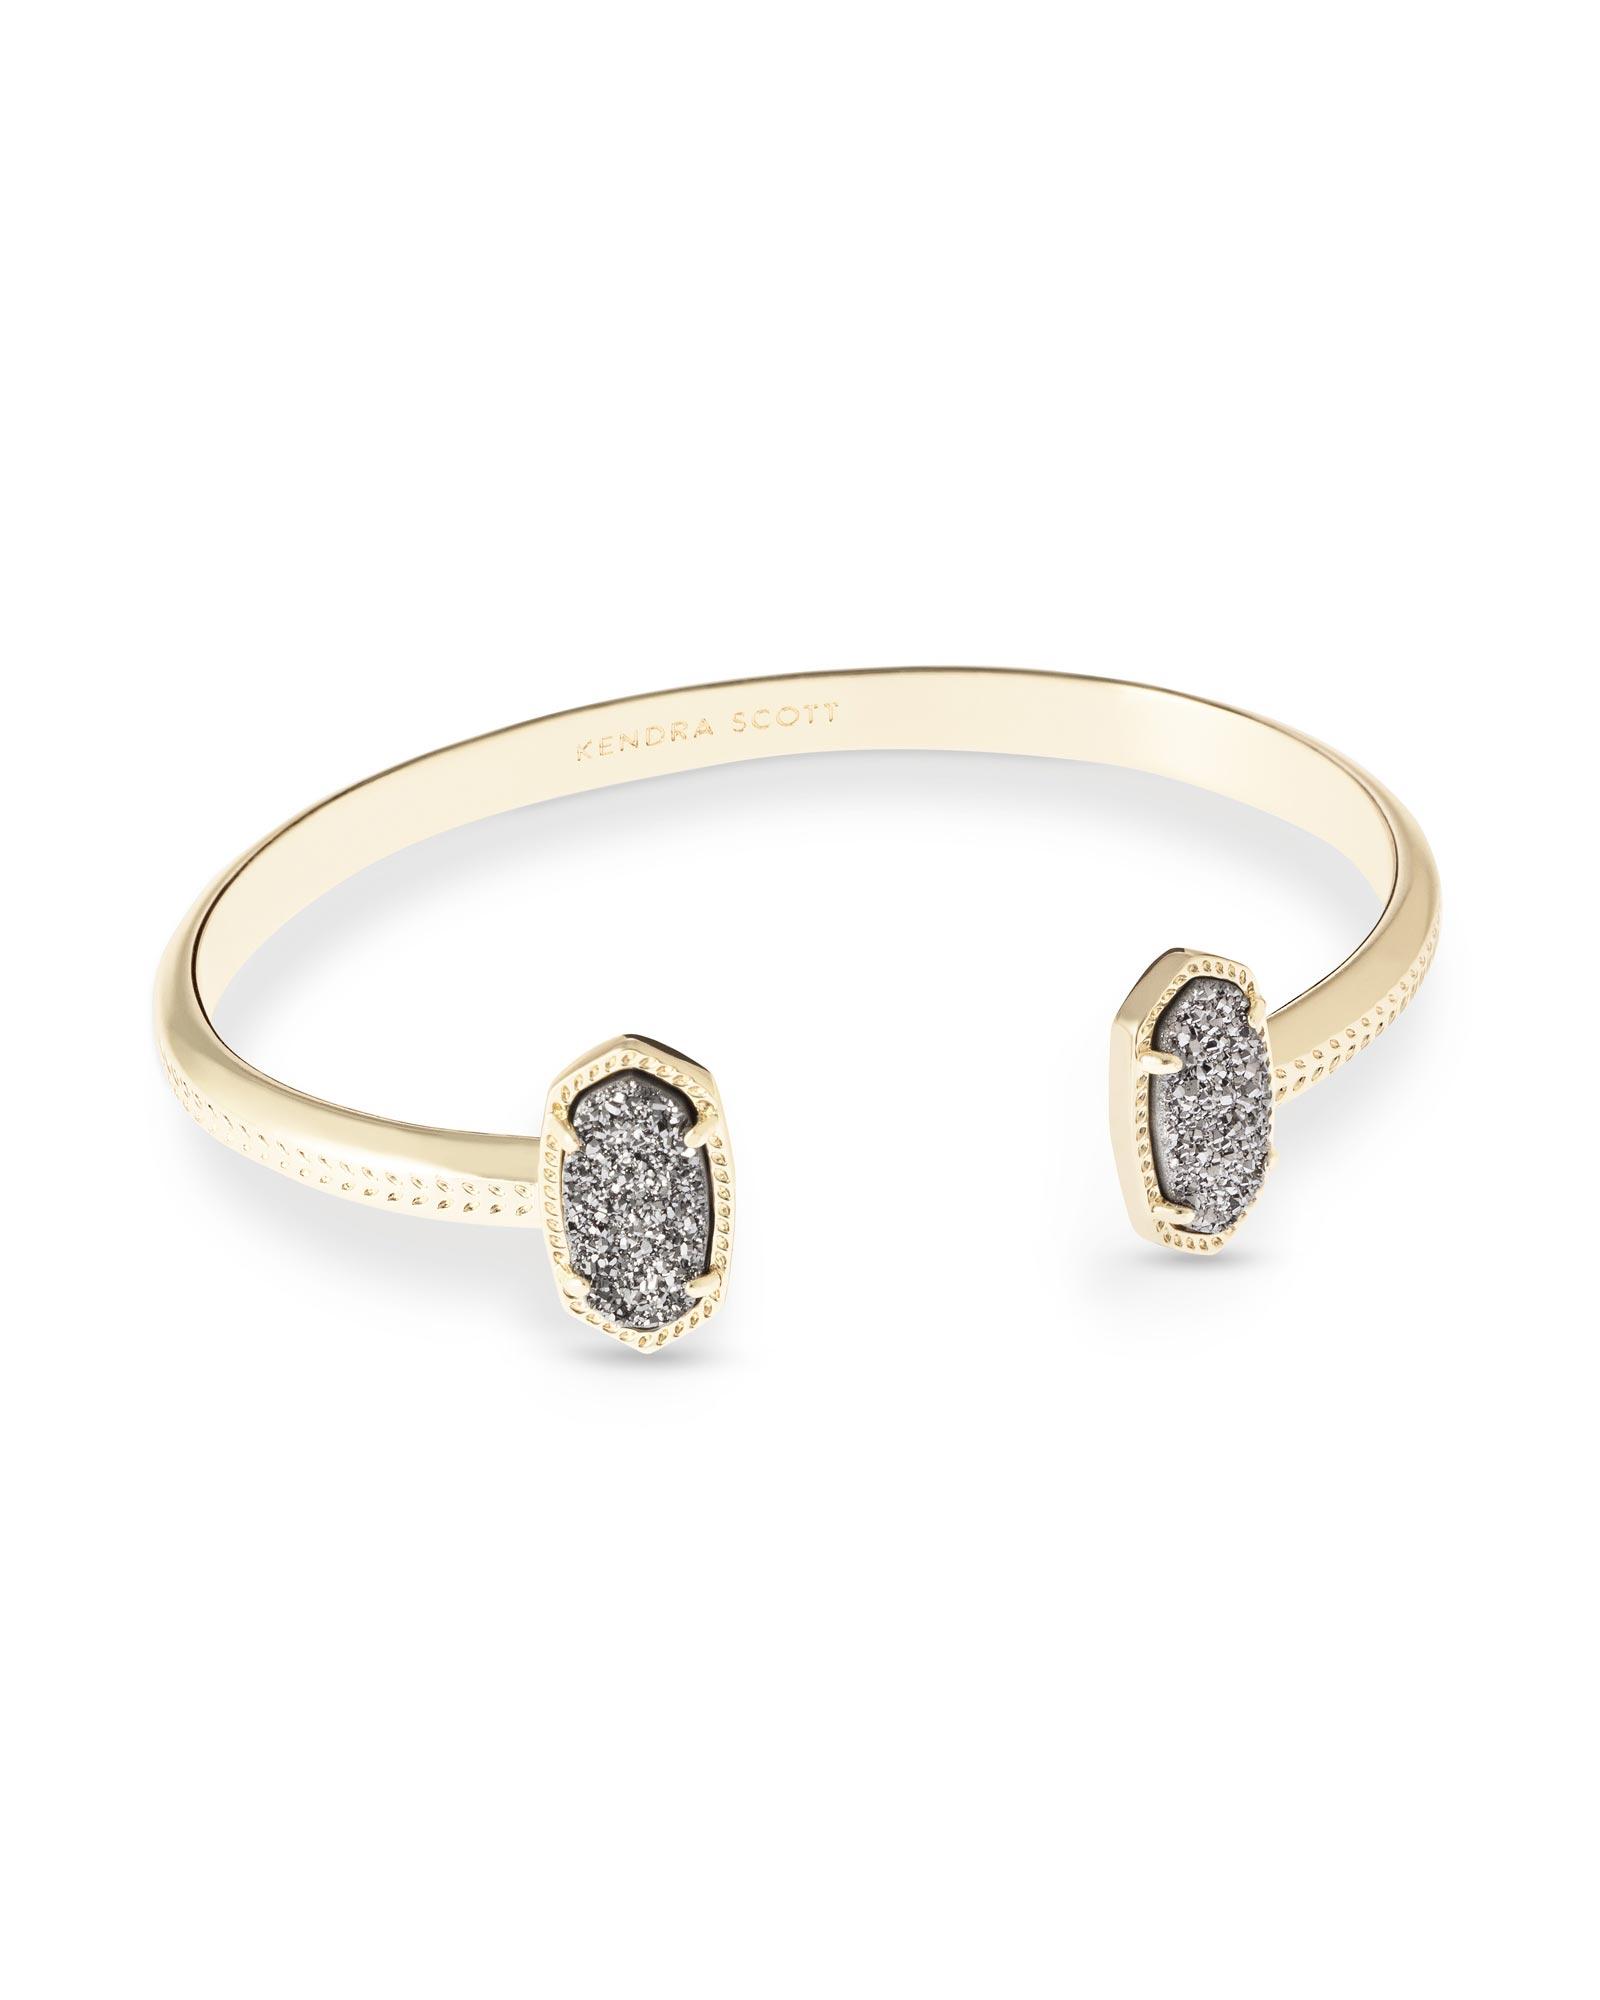 Illusions jewelry myrtle beach sc style guru fashion for Kendra scott fine jewelry